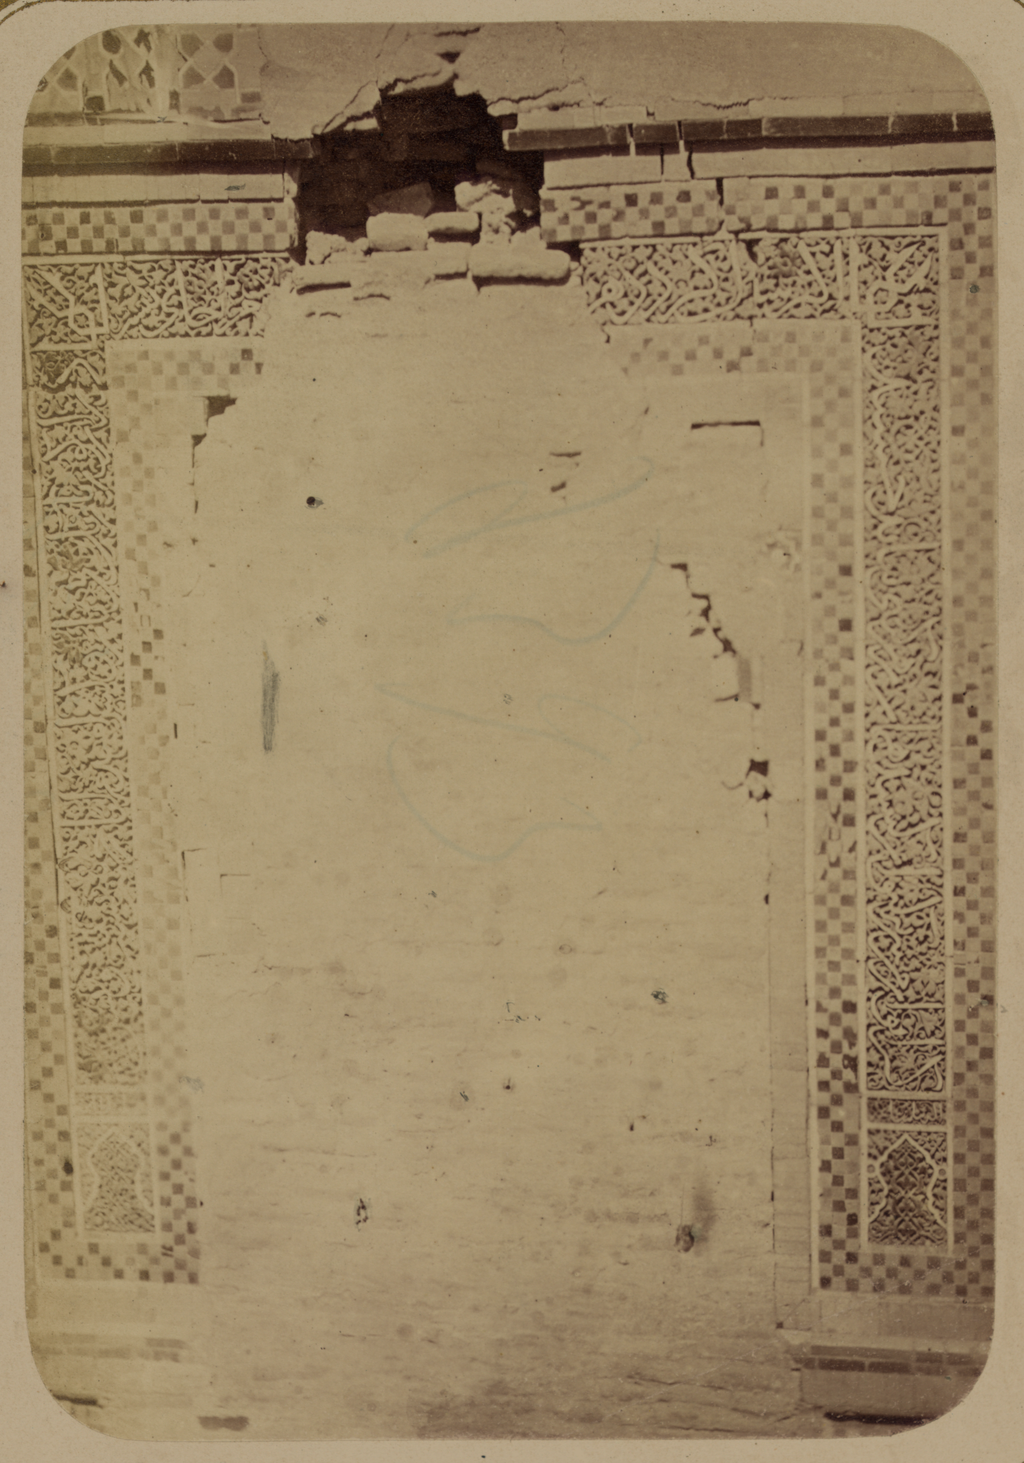 Мавзолей дочери эмира Ходжи Туглу-Текин. Надпись над бывшим входом